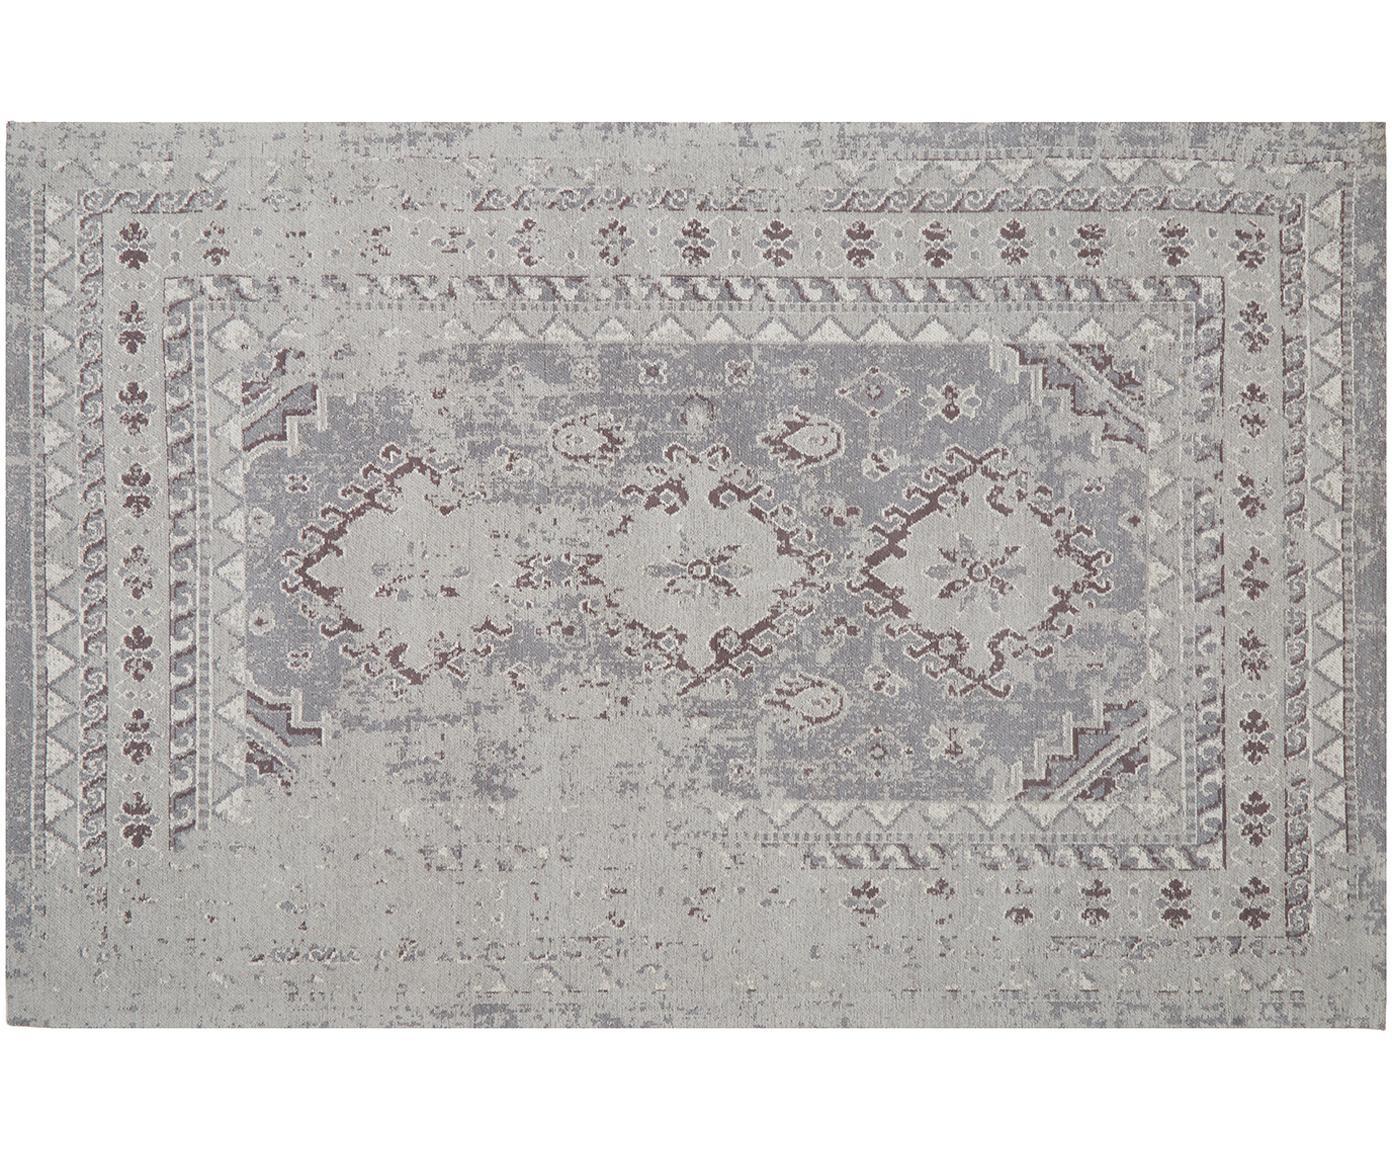 Vintage Chenilleteppich Rebel in Grau, Flor: 95% Baumwolle, 5% Polyest, Hellgrau, Creme, B 120 x L 180 cm (Grösse S)